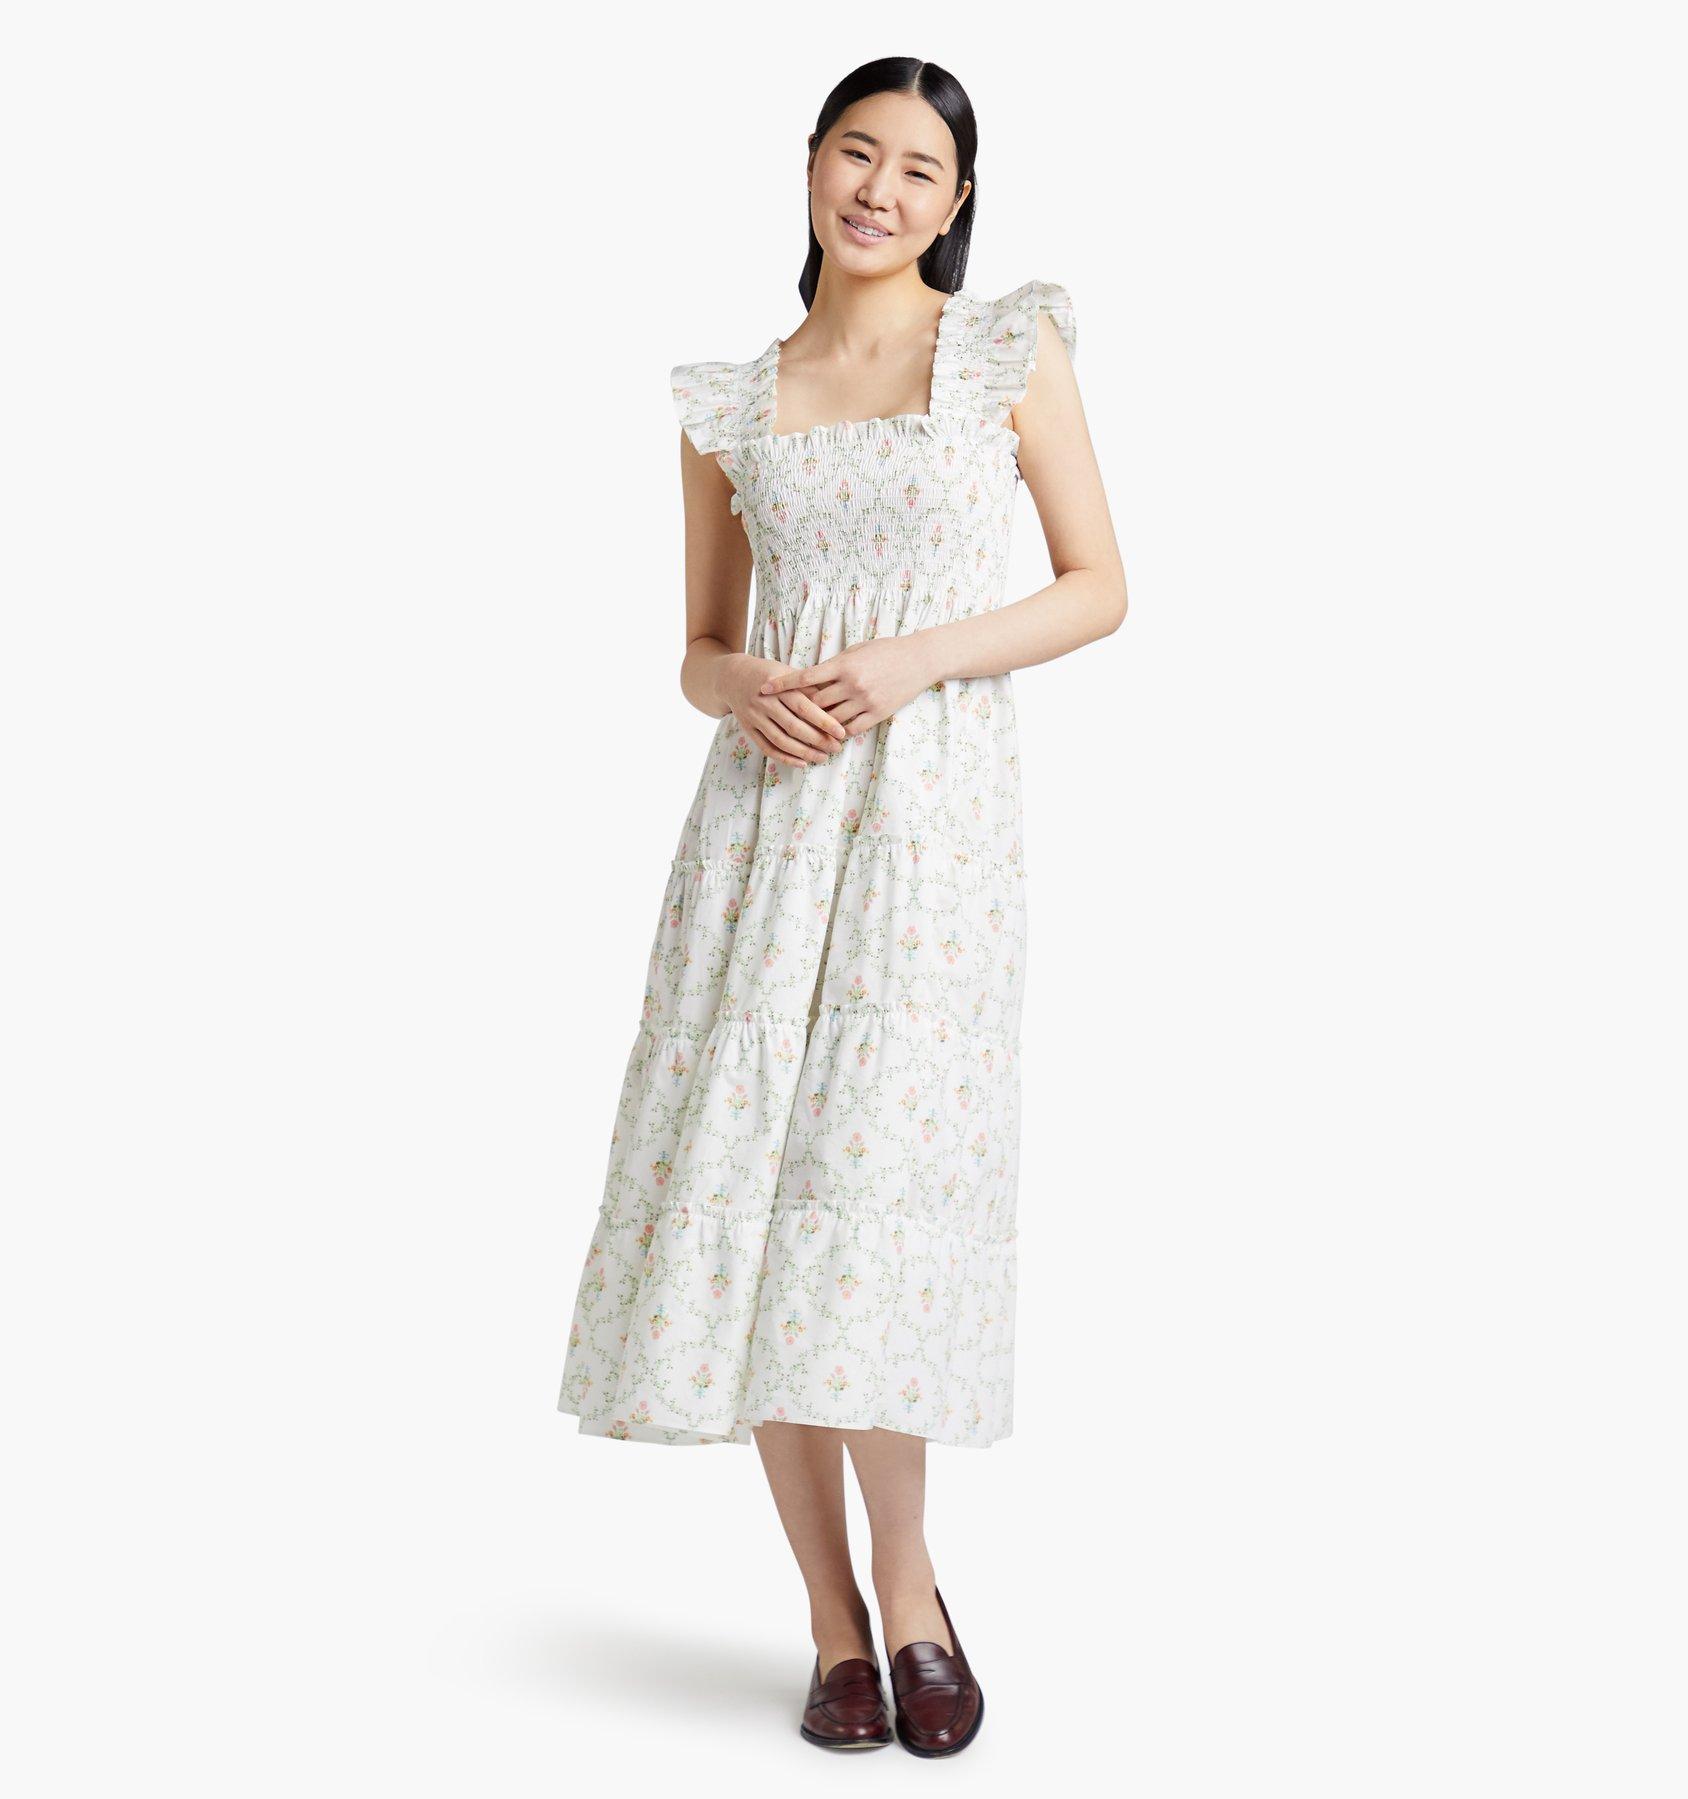 Hill House Ellie Nap Dress